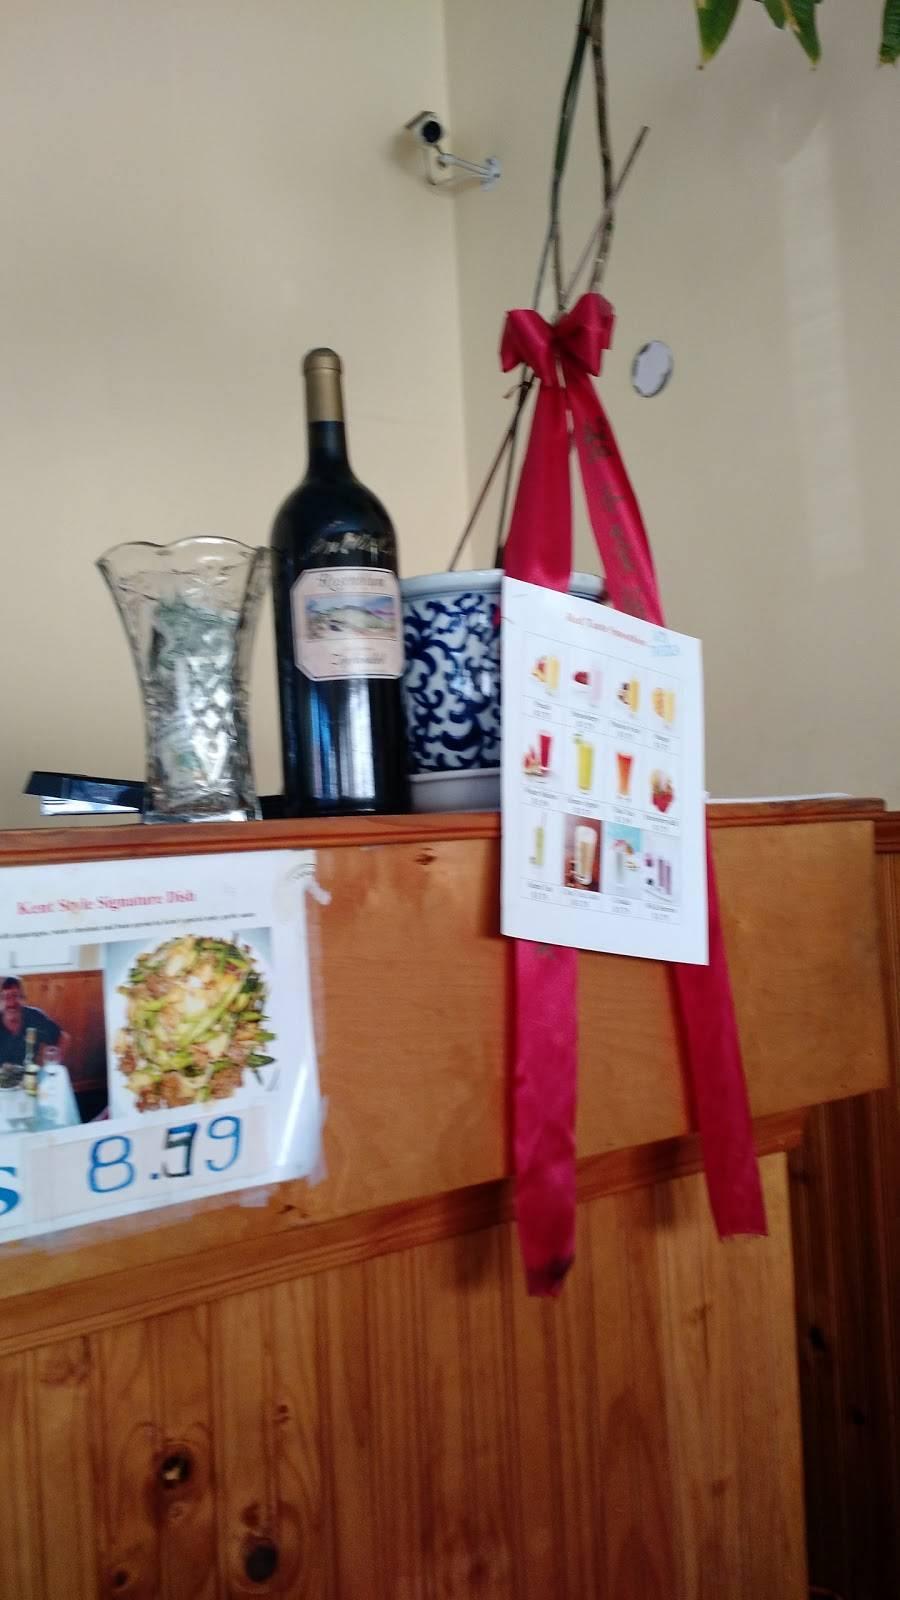 Dragon Village   restaurant   3324, 642 Lincoln Ave, Alameda, CA 94501, USA   5105236461 OR +1 510-523-6461